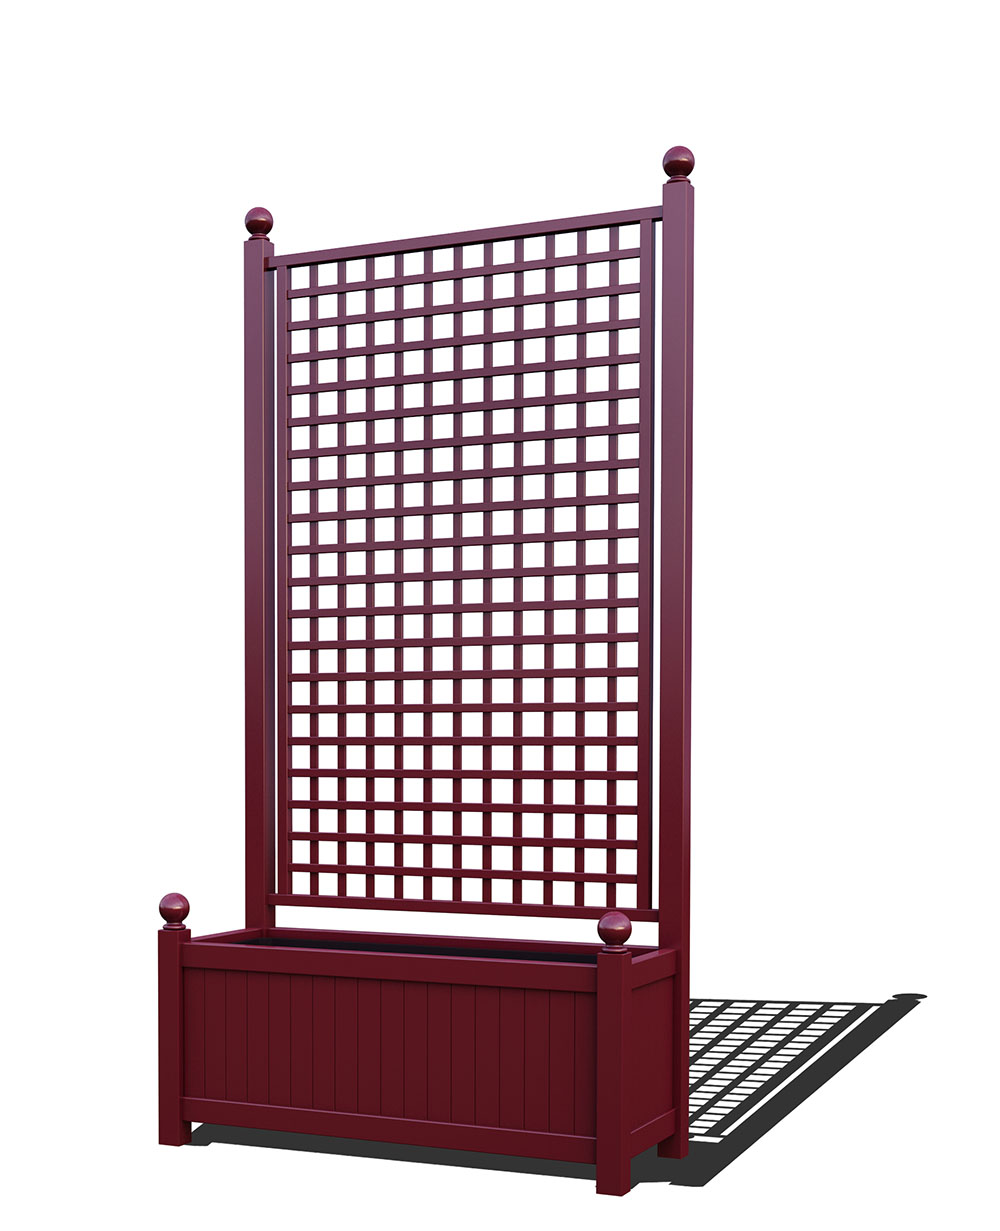 R17-A-SHD-Langer Metall Pflanzkübel mit integriertem Rankgitter in RAL 3005 wine red